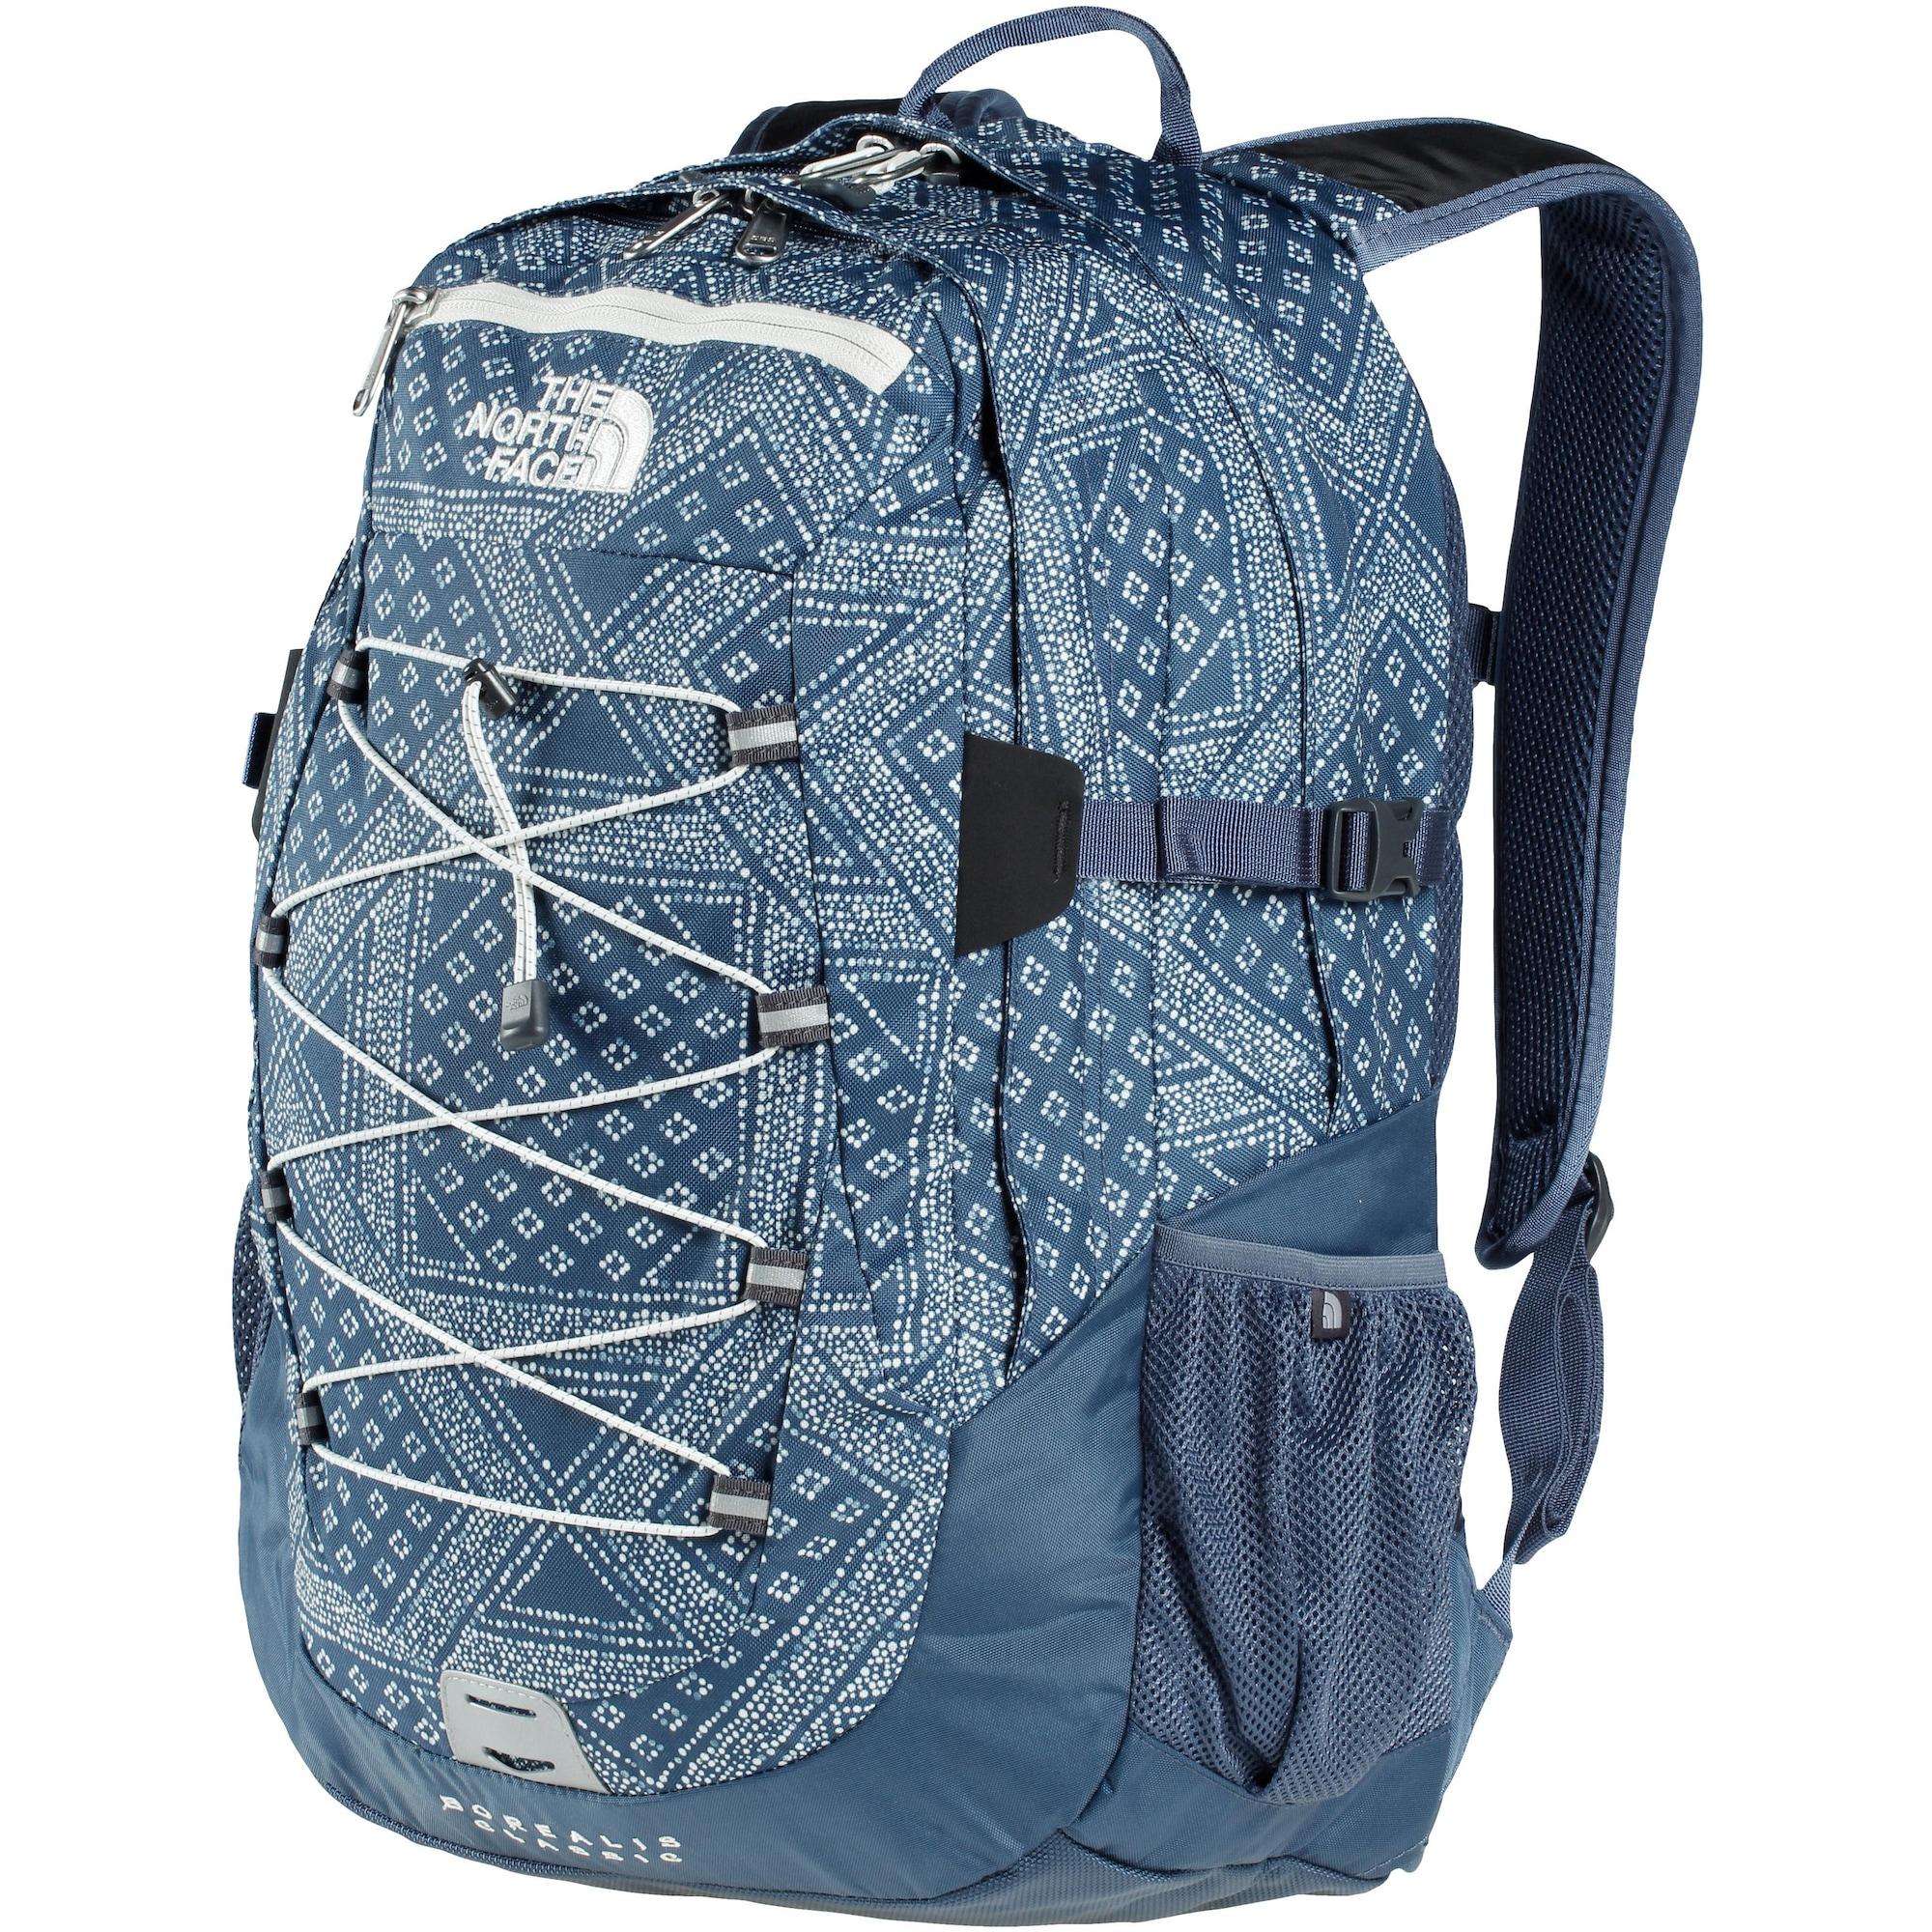 Daypack 'Borealis Classic' | Taschen > Rucksäcke > Tourenrucksäcke | Hellblau - Dunkelblau | The North Face